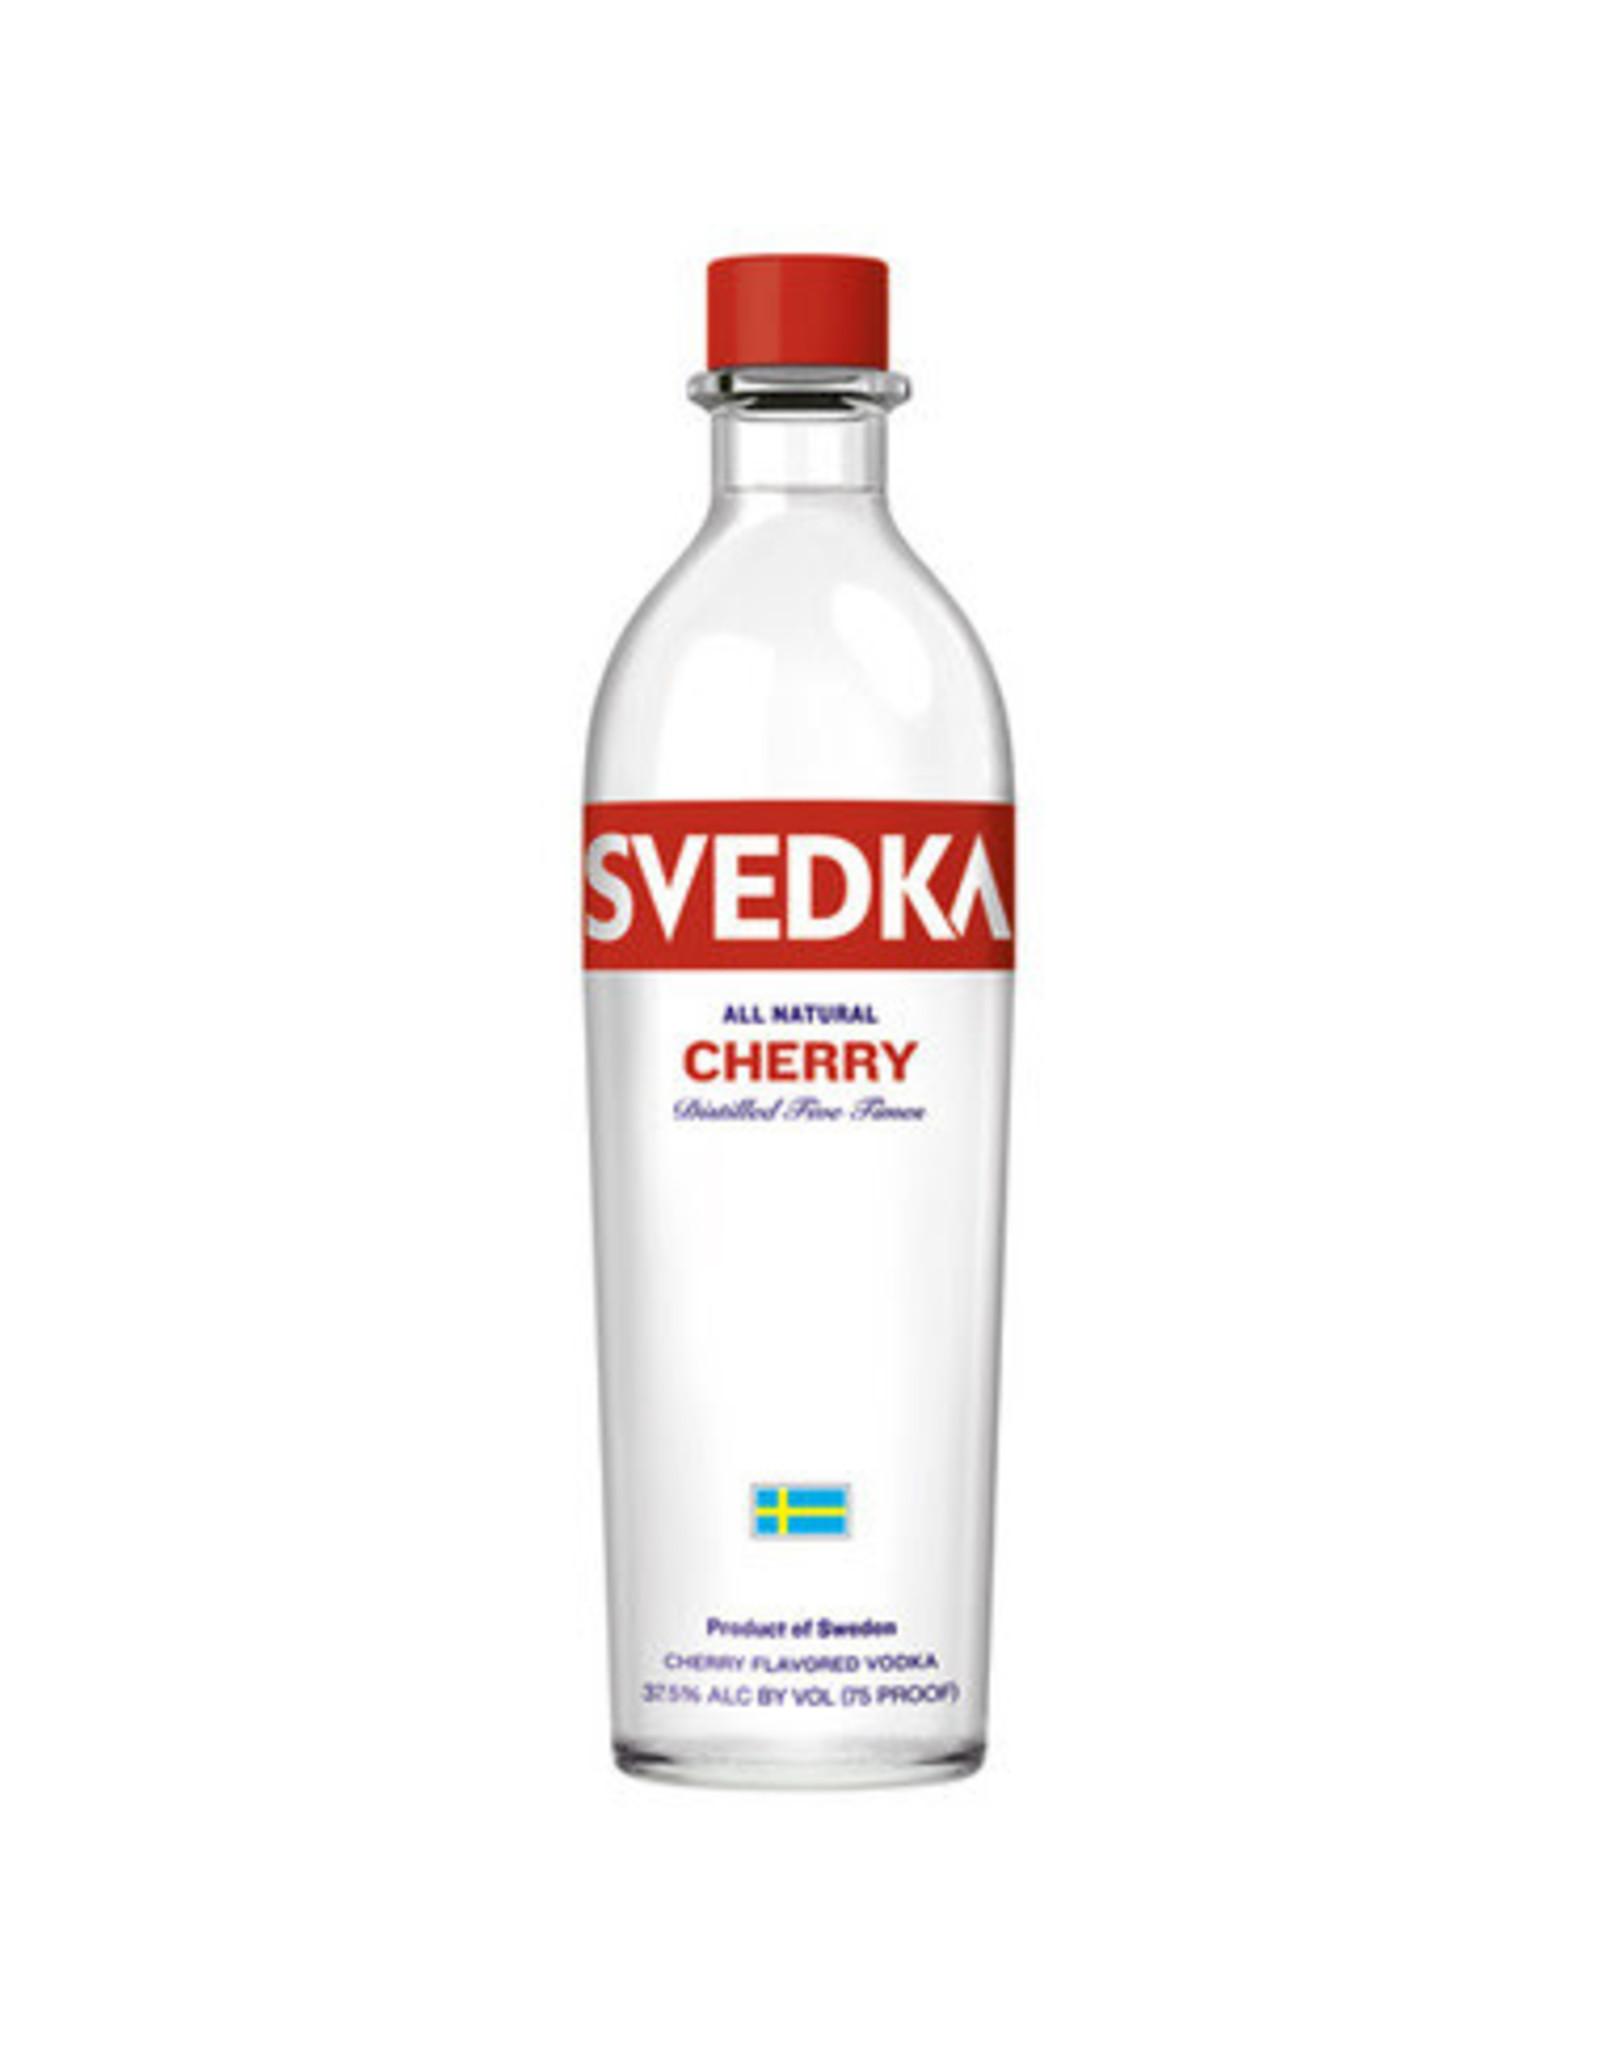 SVEDKA CHERRY 750ML